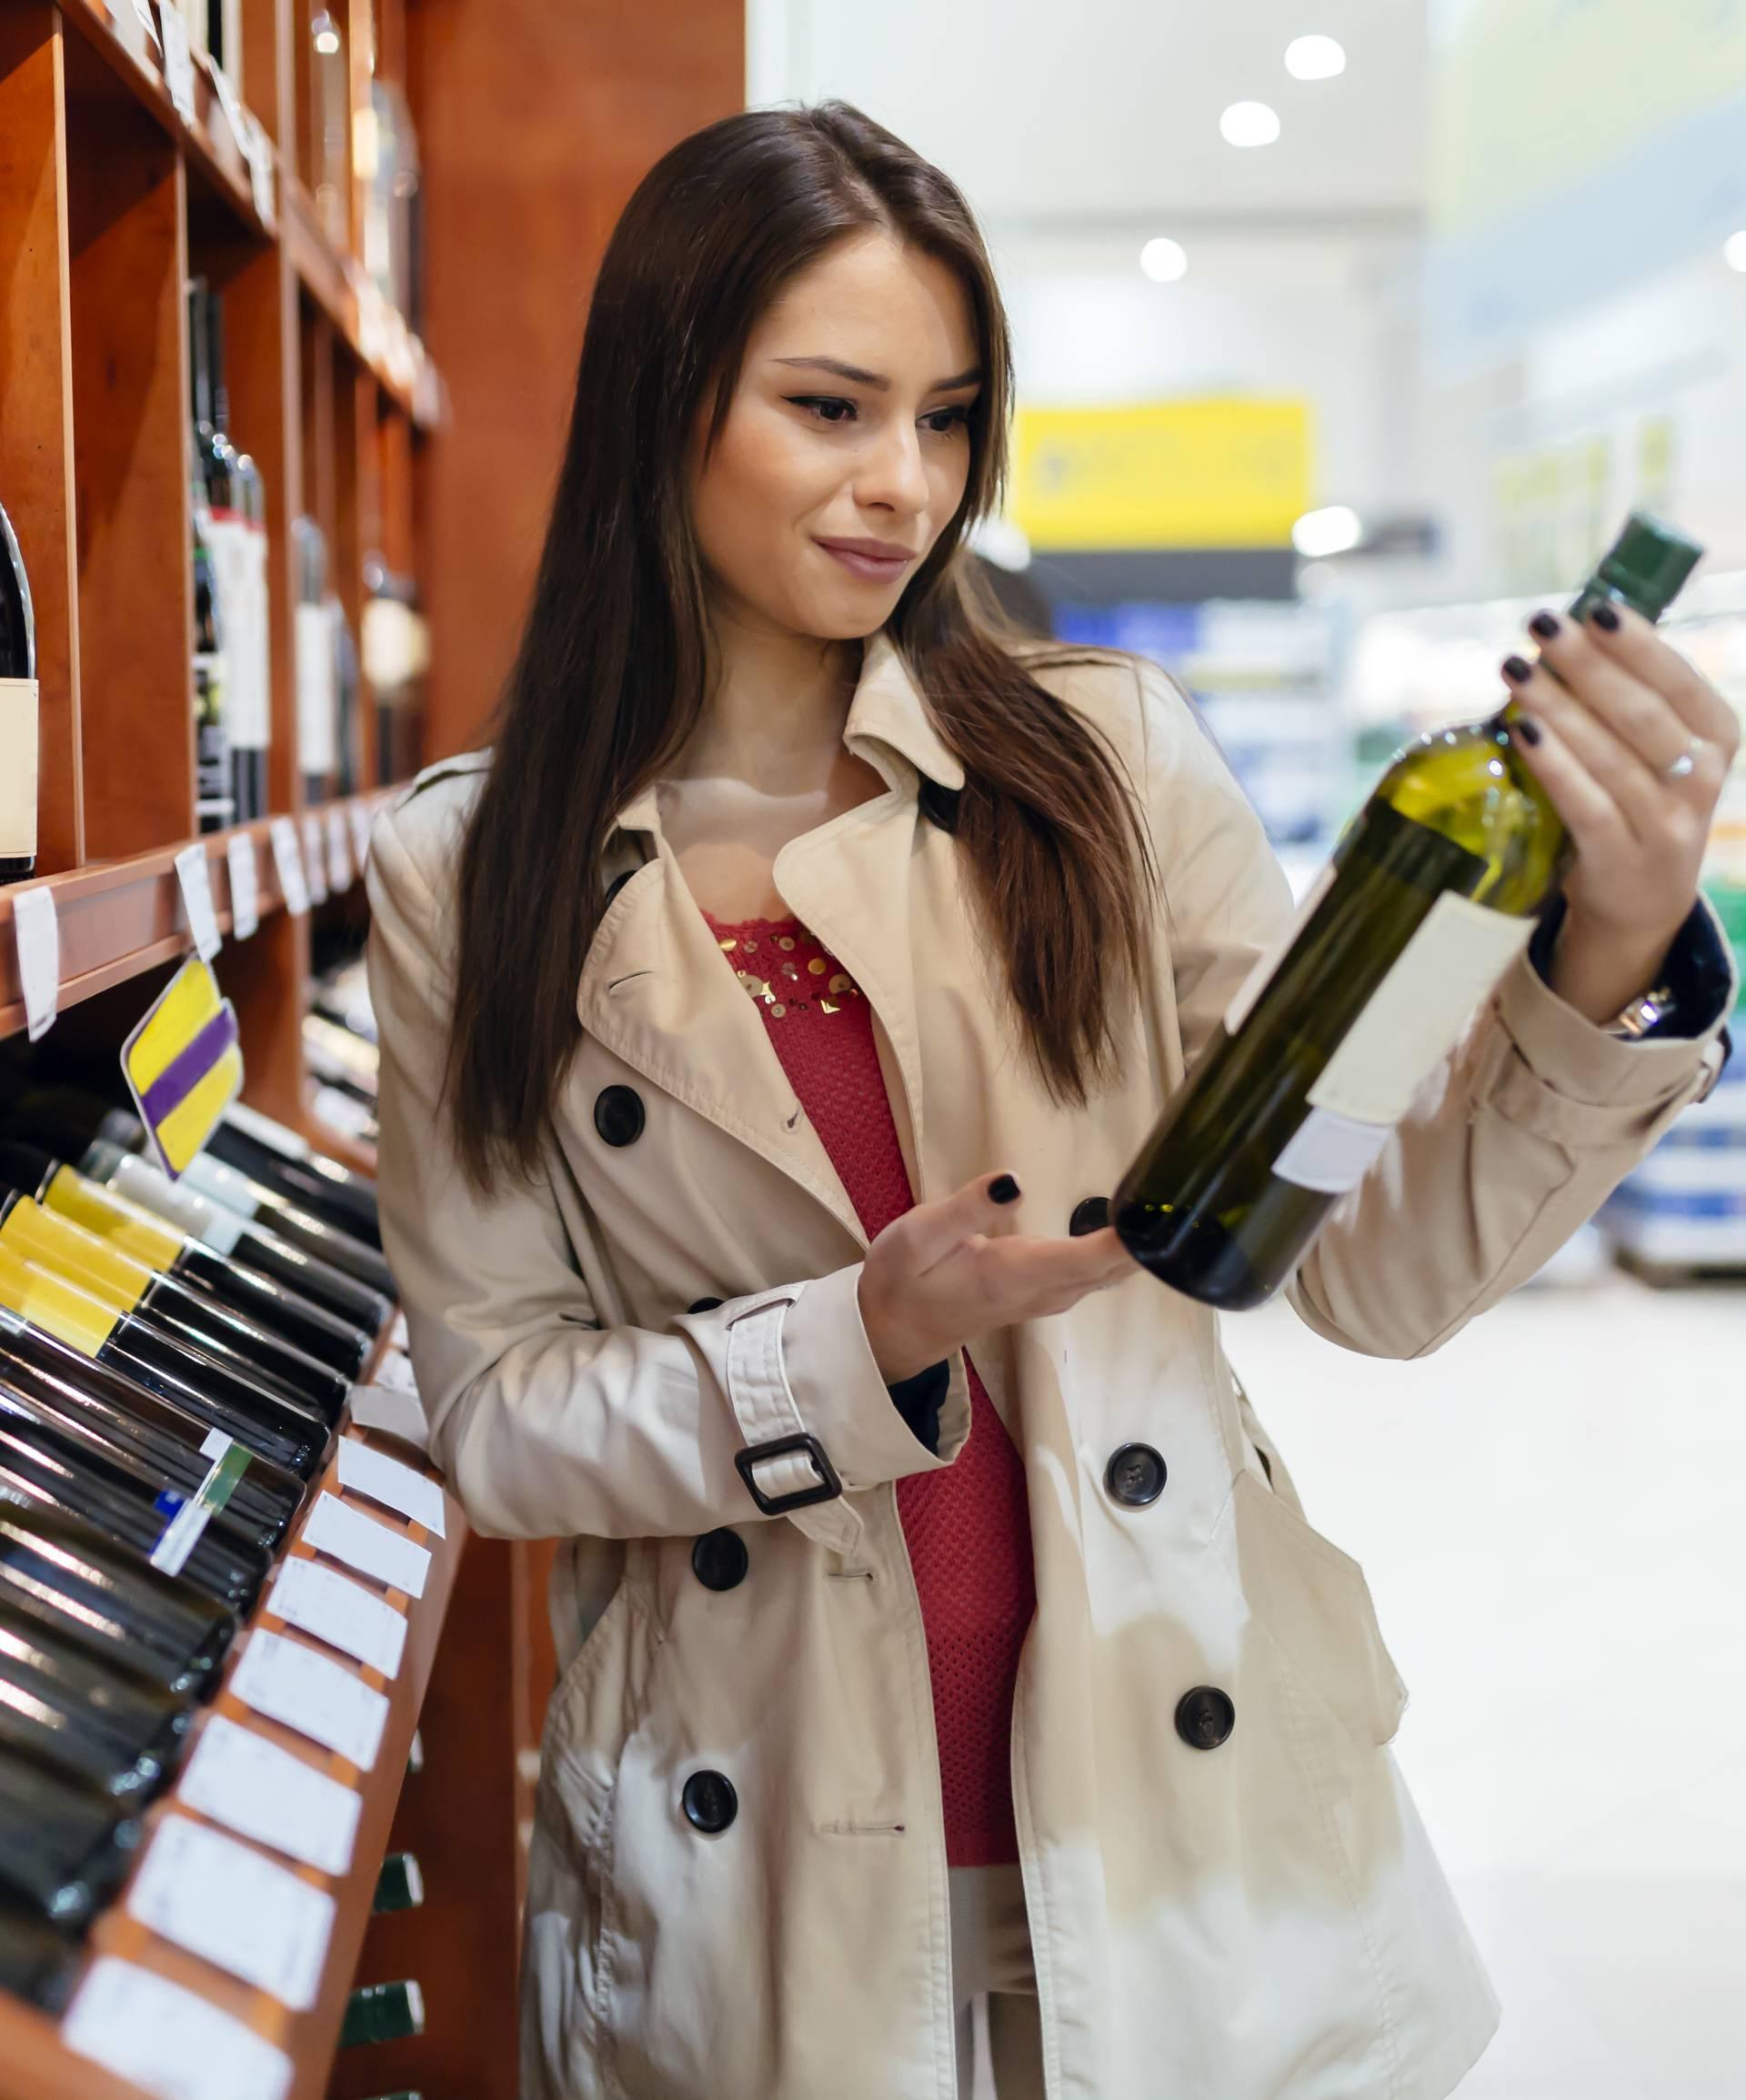 Zaboravite WC papir, Španjolci gomilaju vino, pivo i čokoladu